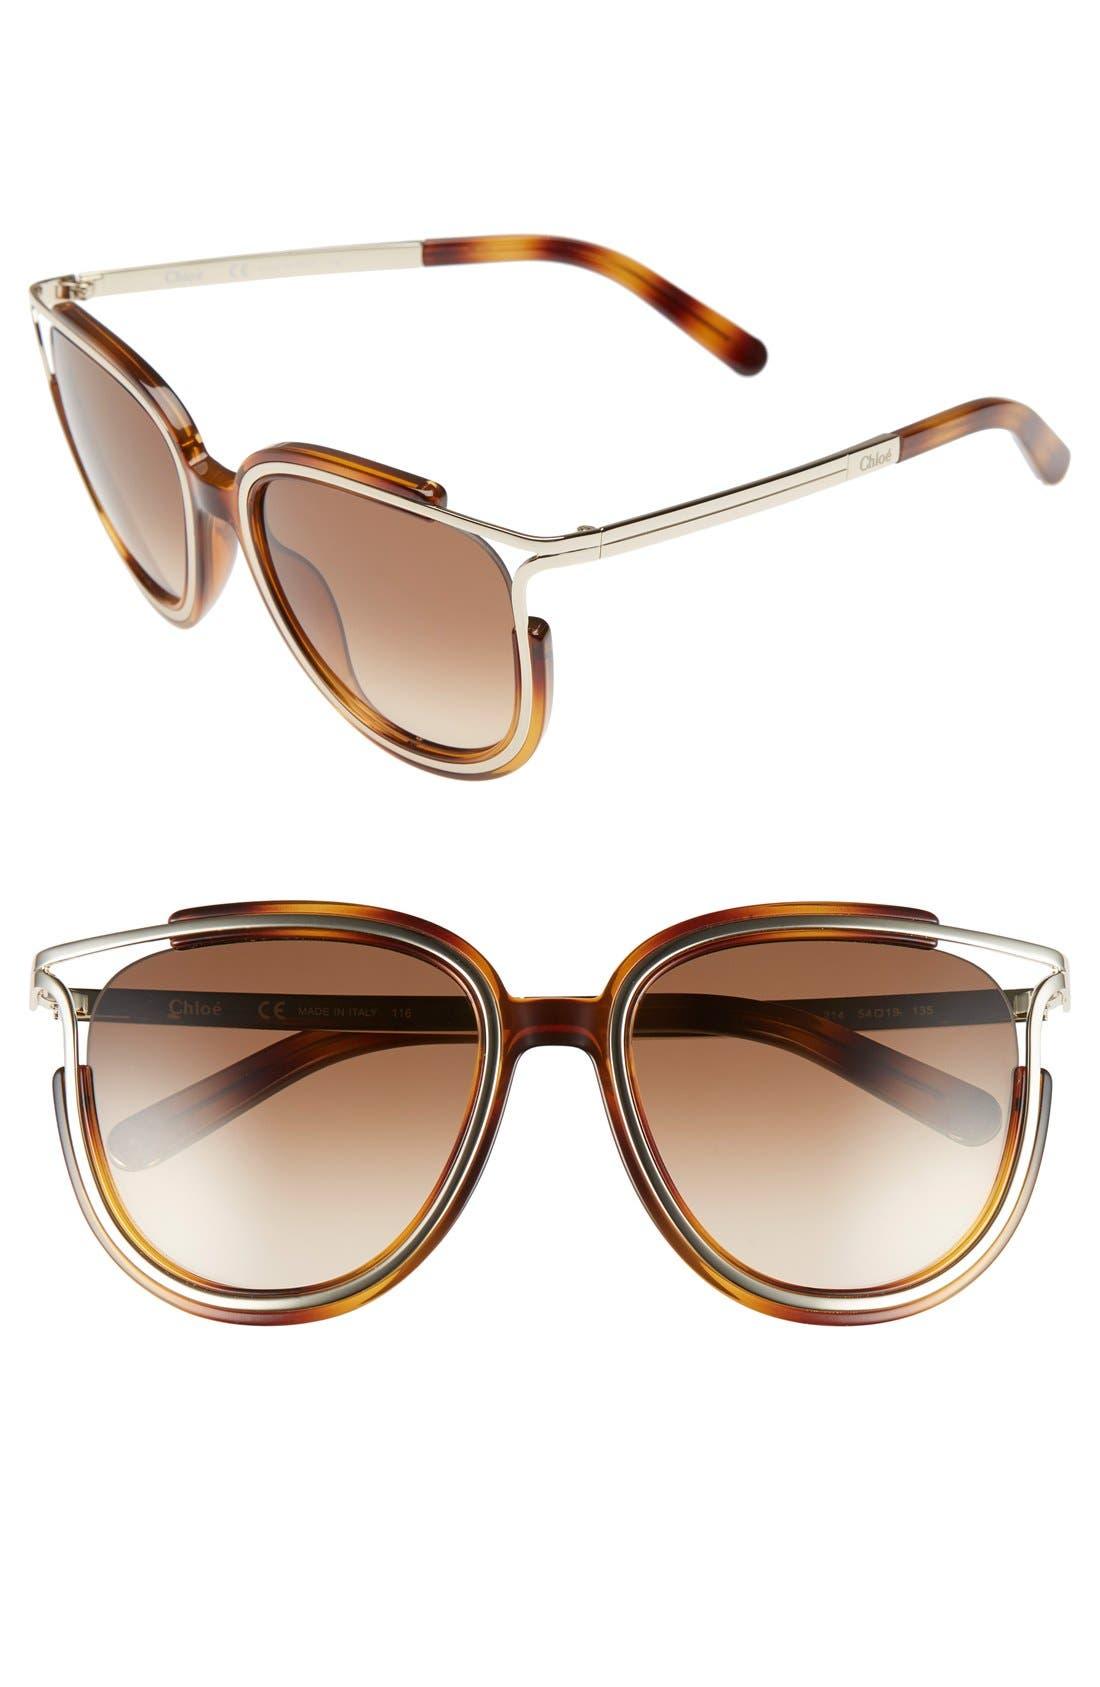 Chloé 'Jayme' 54mm Retro Sunglasses